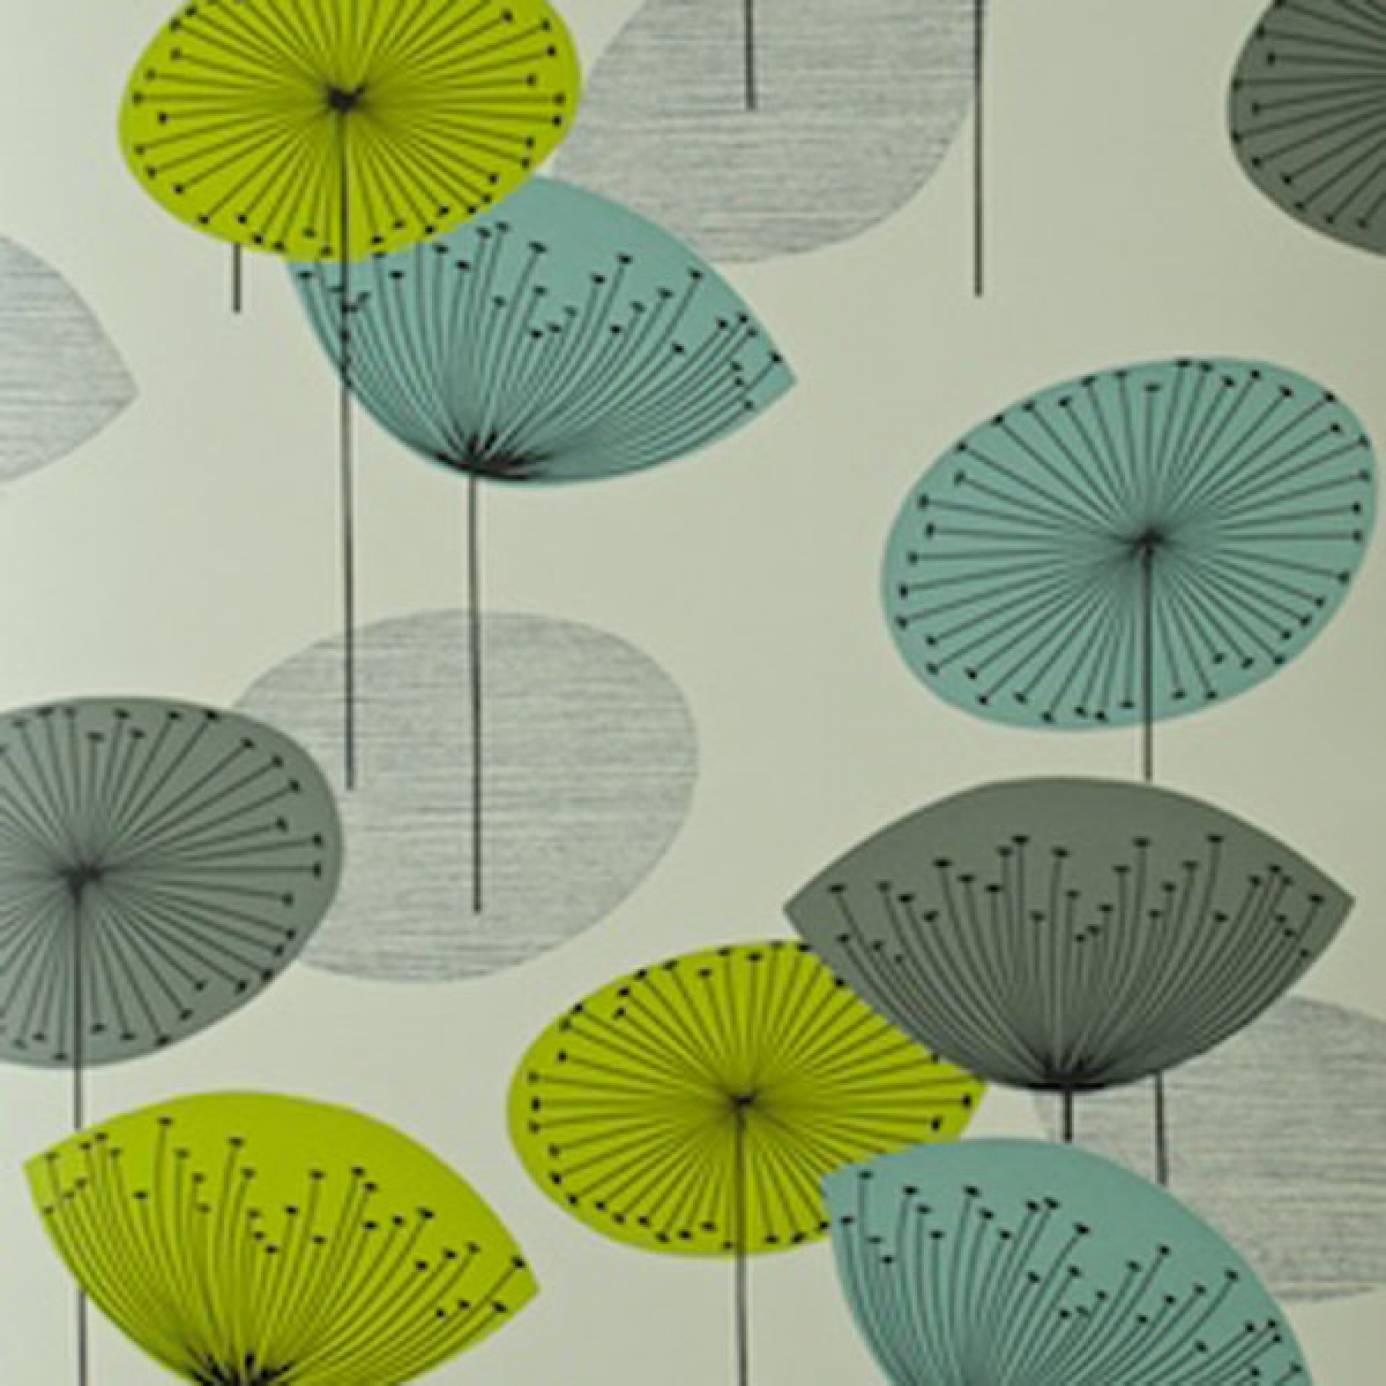 Dandelion Clocks Wallpaper Chaffinch DOPWDA104